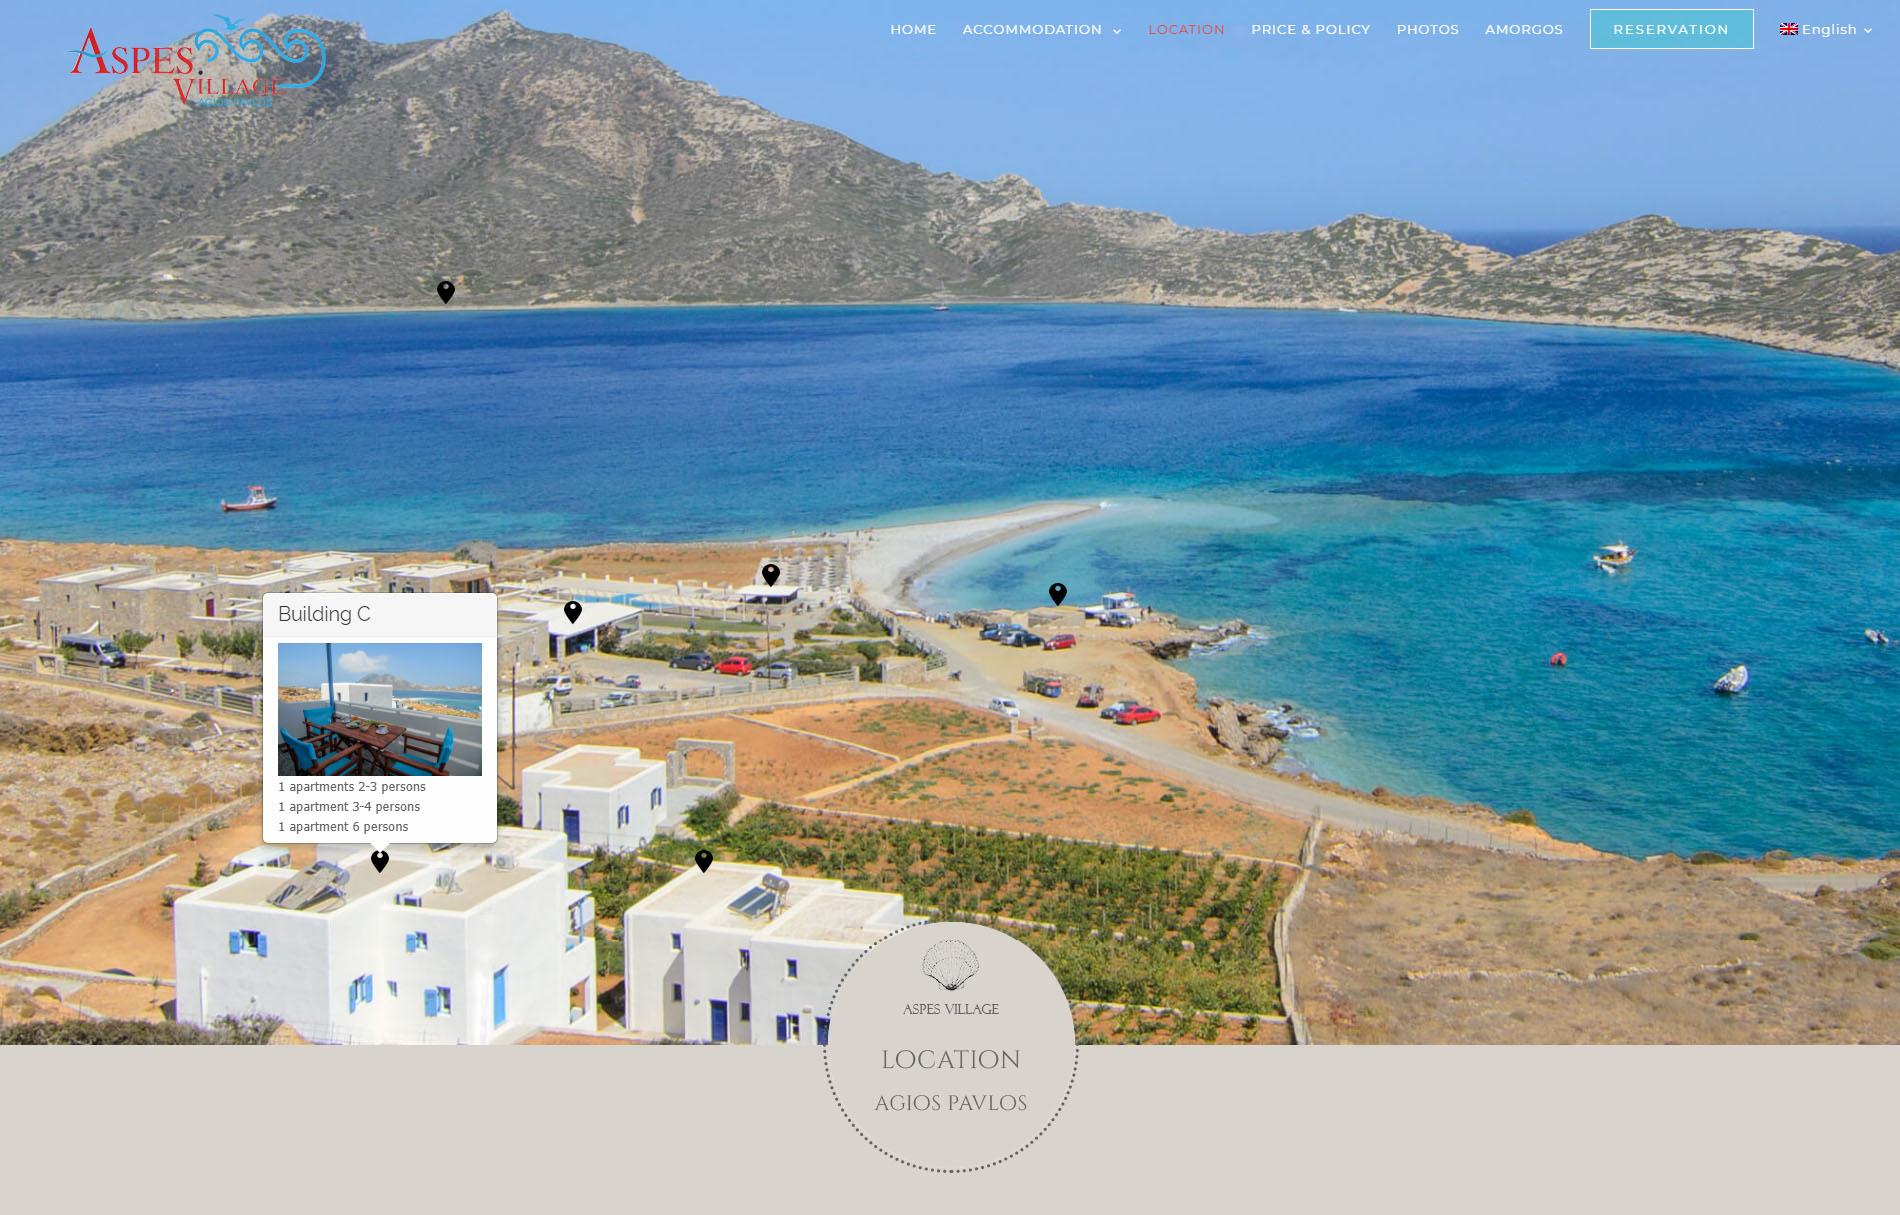 Aspes Village Amorgos Accommodation Website